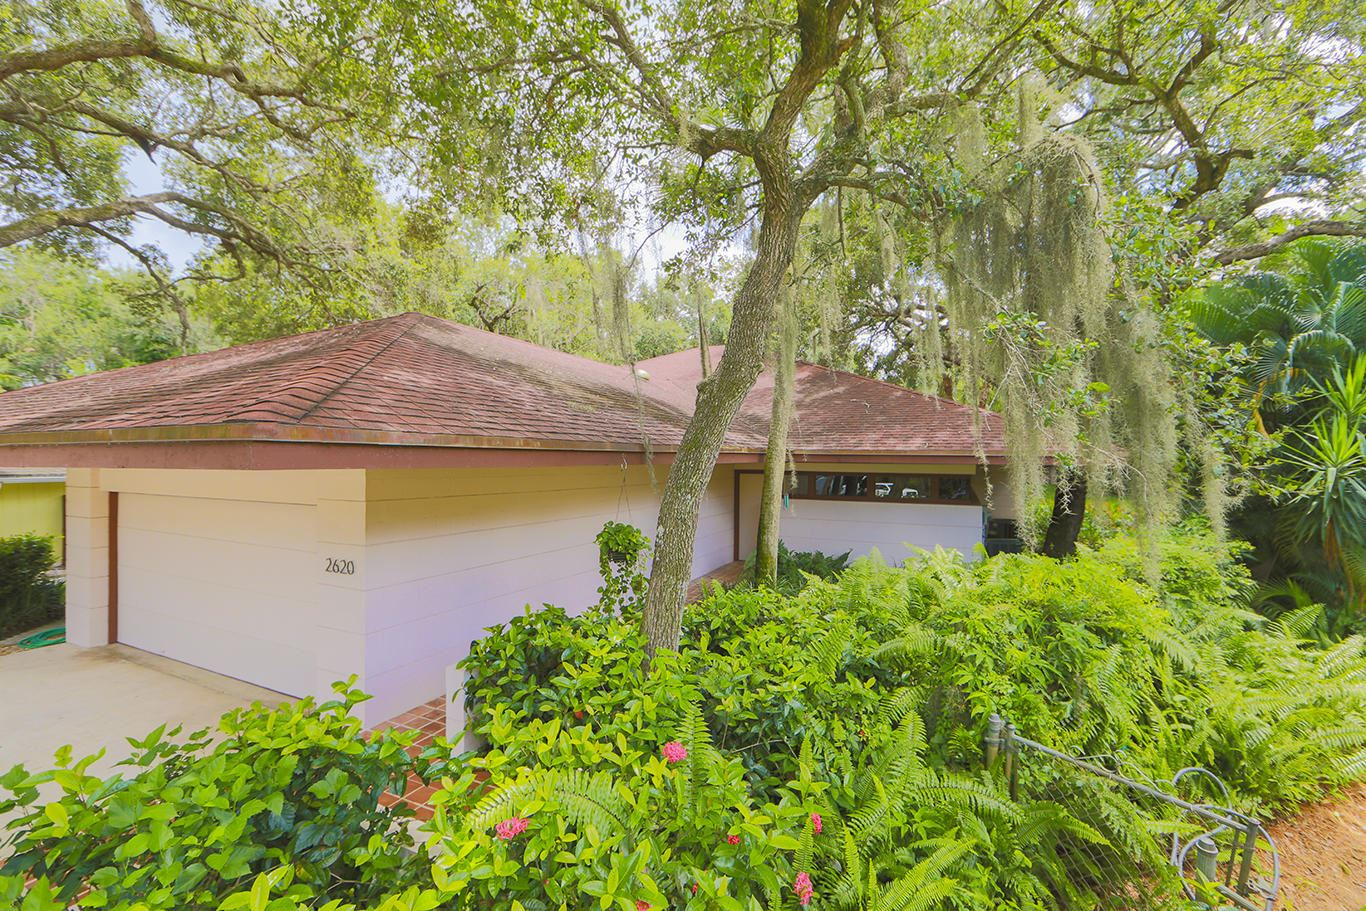 2620 Prosperity Oaks Court, Palm Beach Gardens, FL 33410 - #: RX-10641289